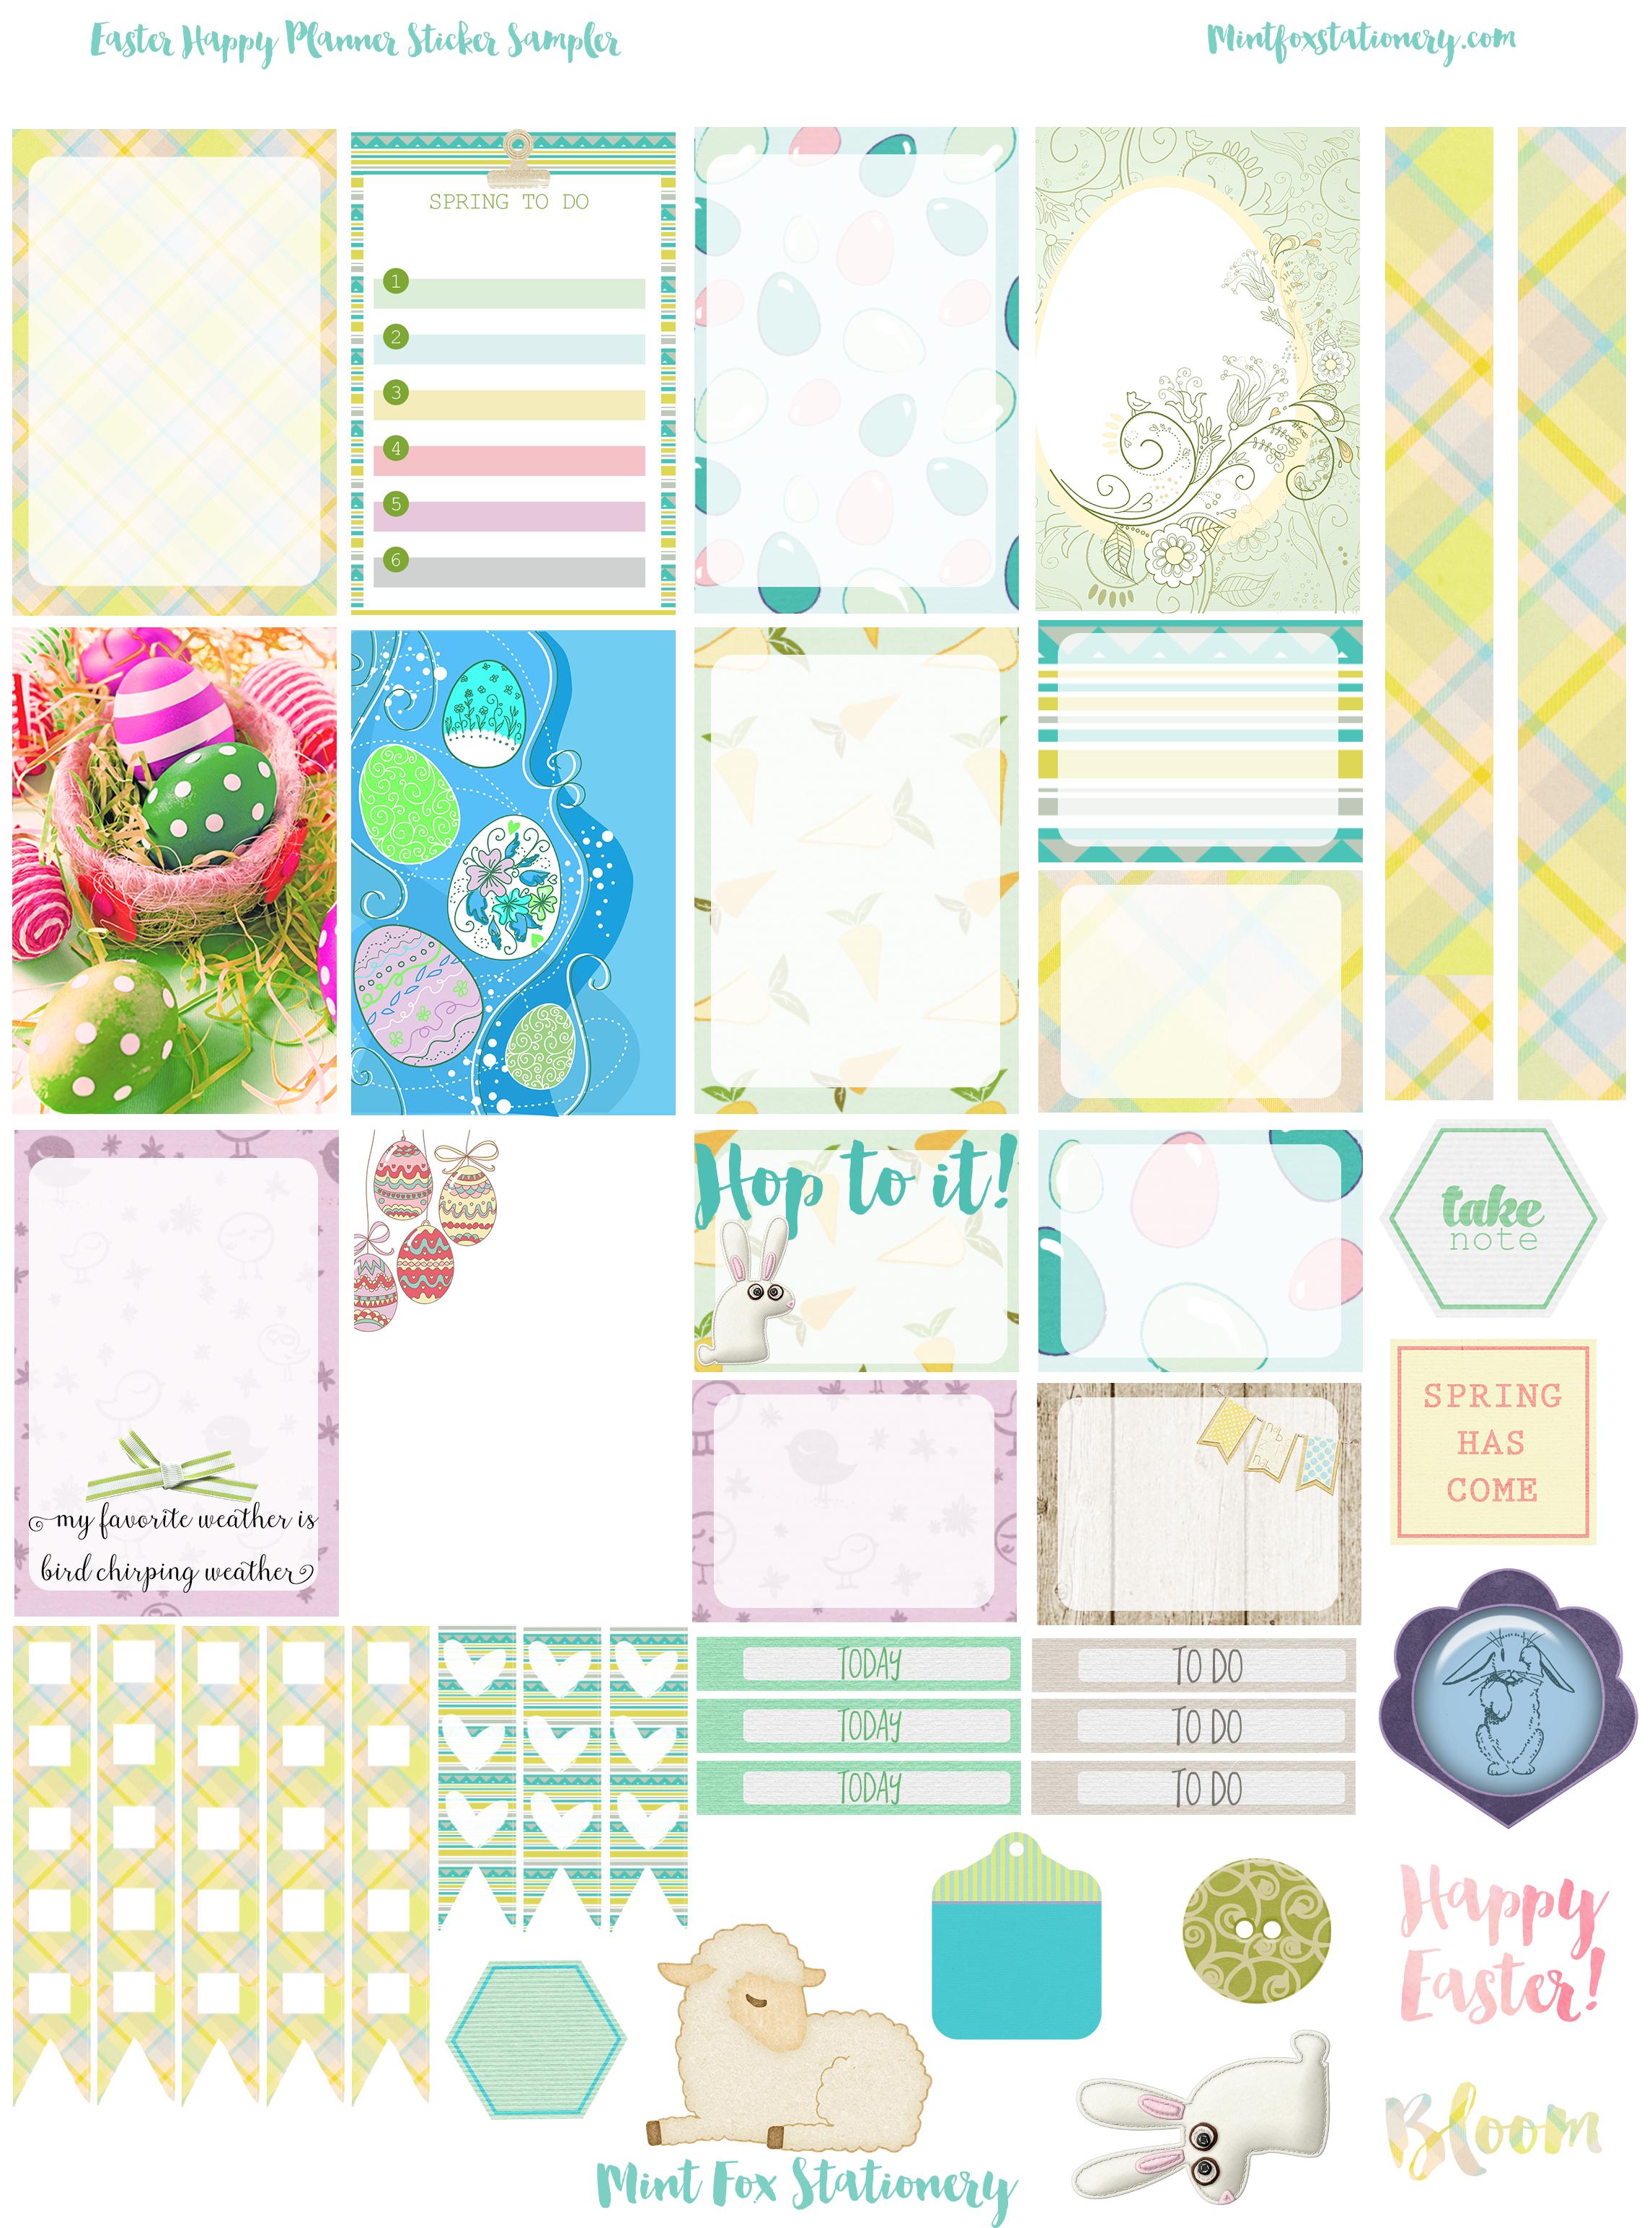 Easter Happy Planner Printable Sticker Sampler Free! - Free Printable Happy Planner Stickers